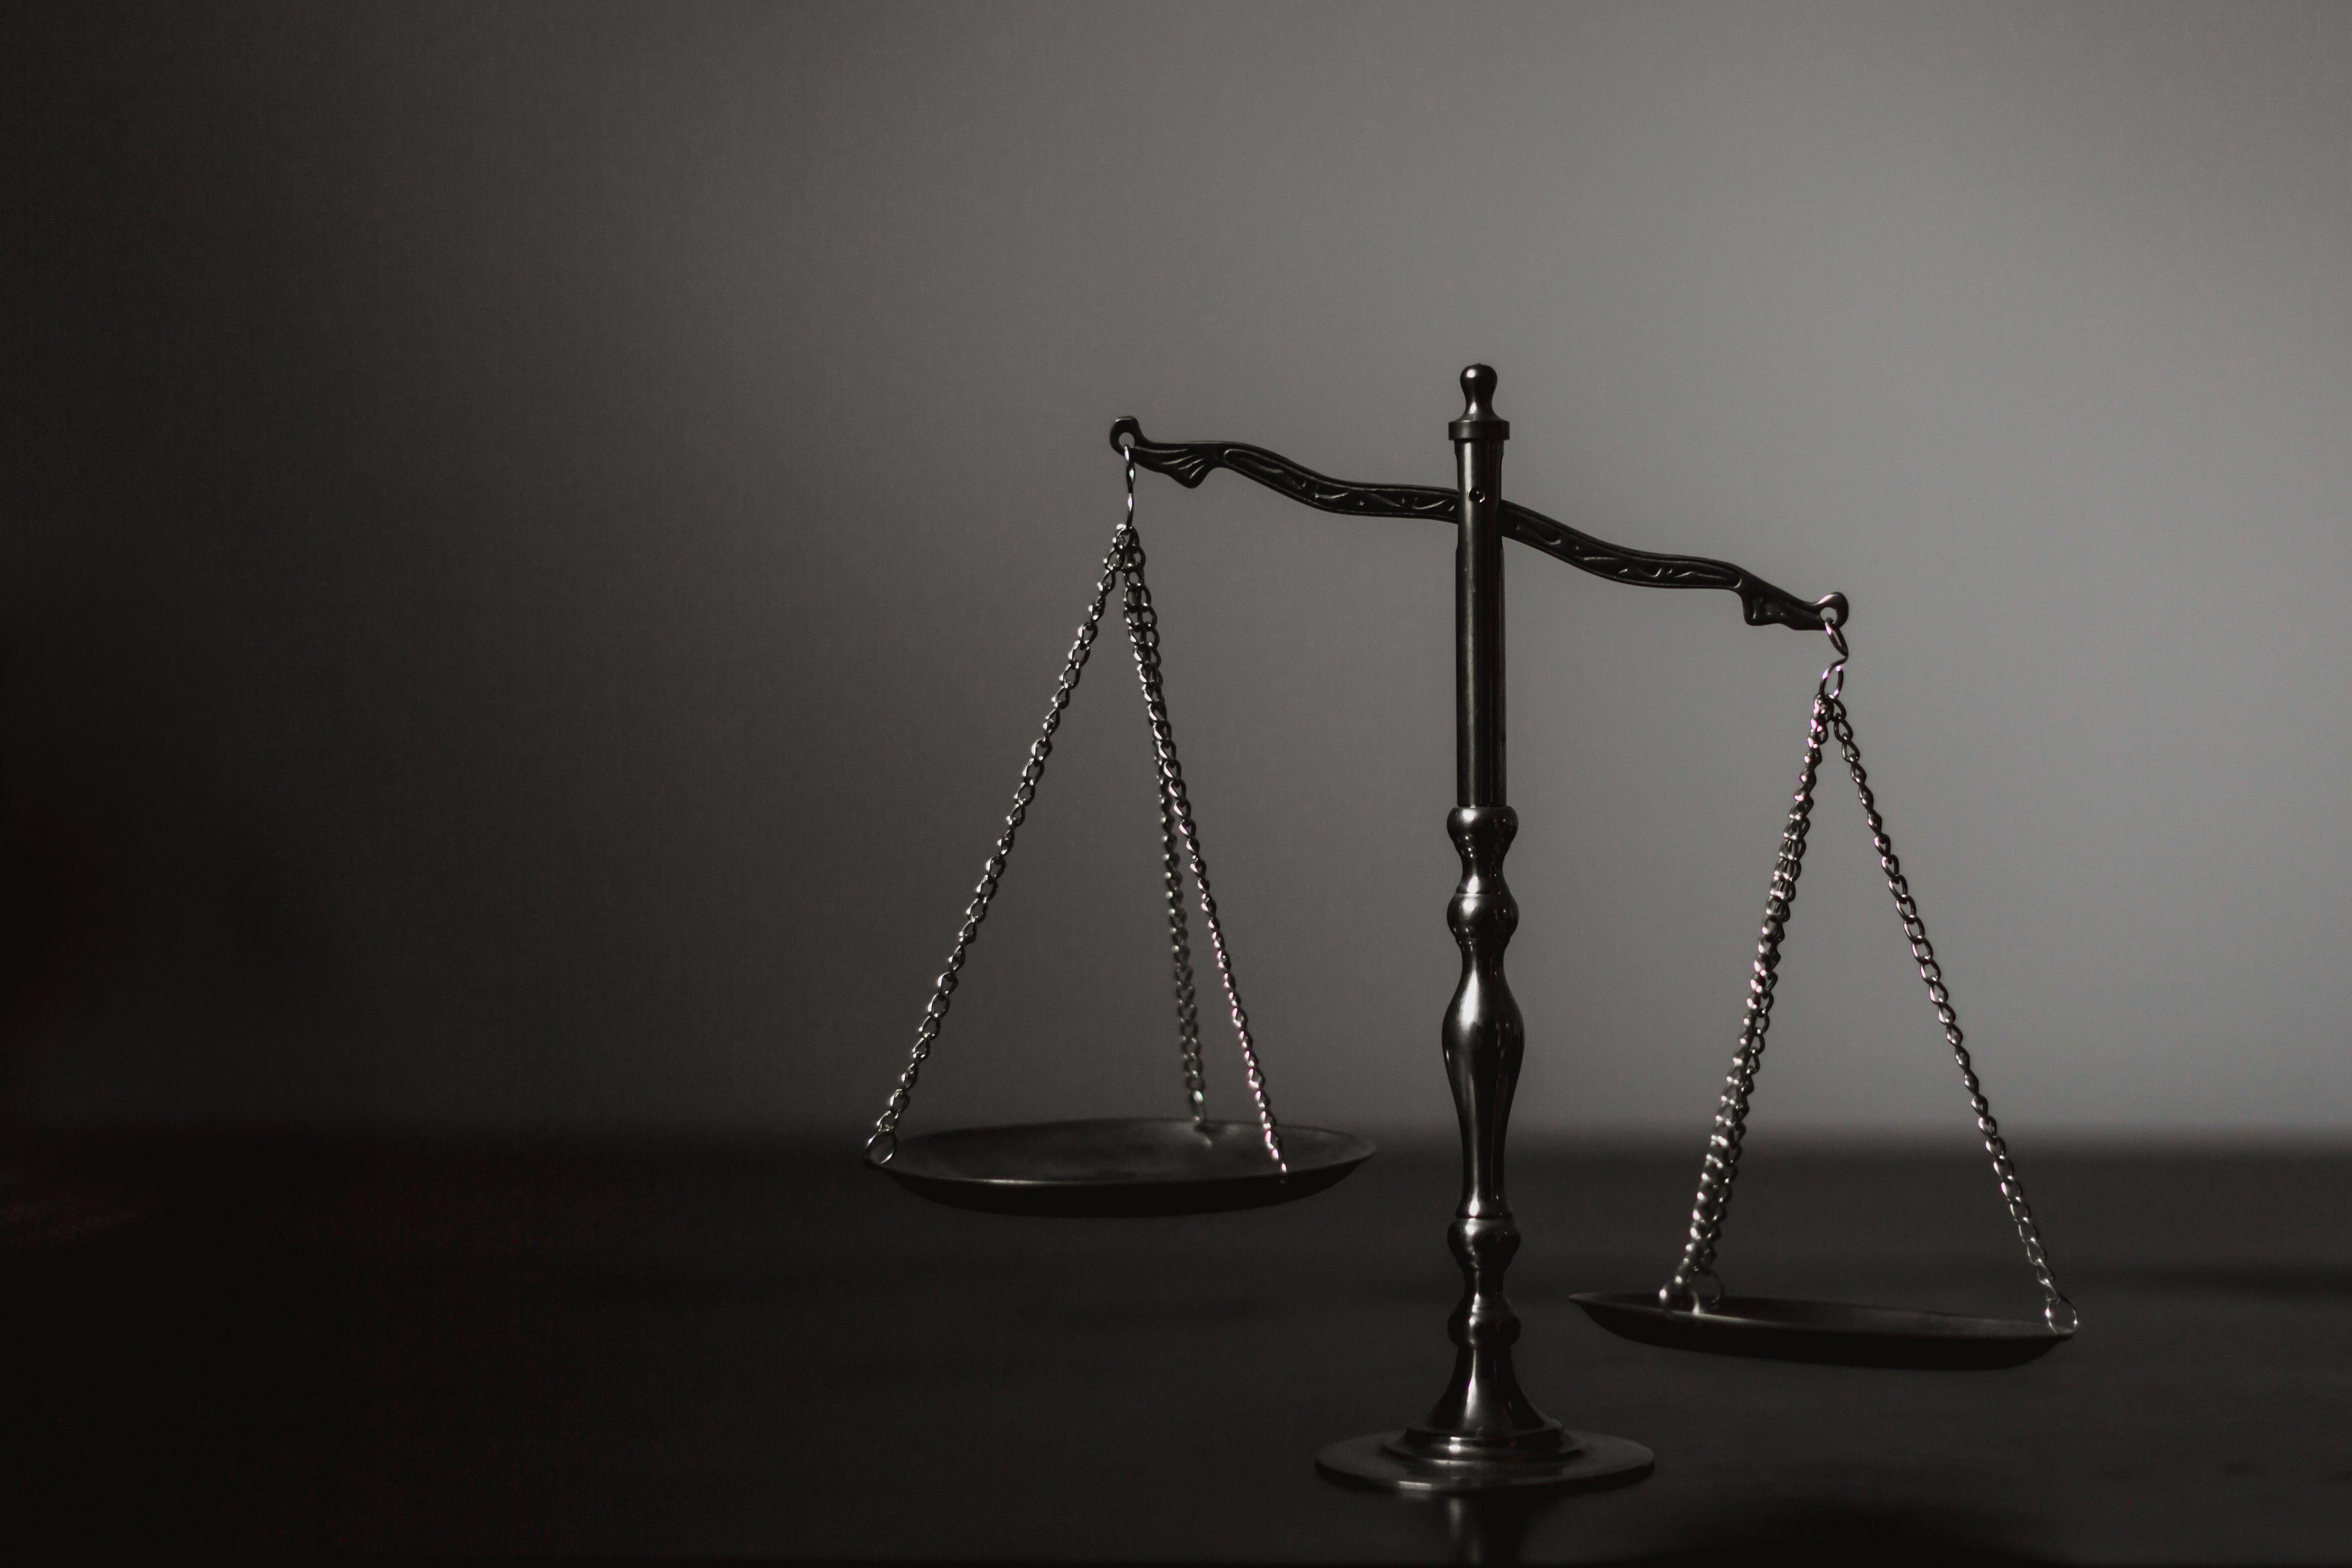 Kucher Law